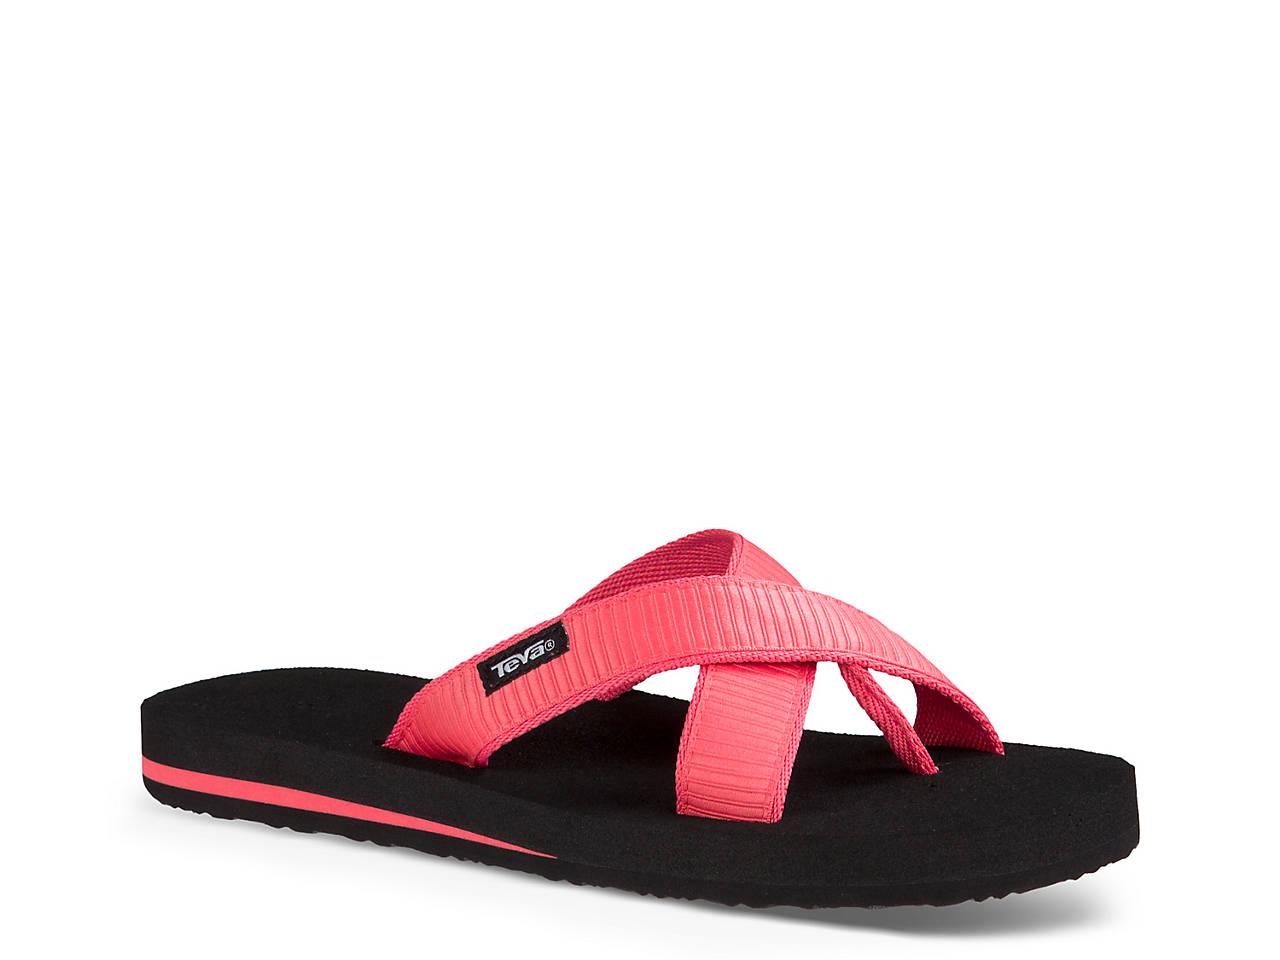 5c63a73f21a7 Teva Mush Kalea Flip Flop Women s Shoes